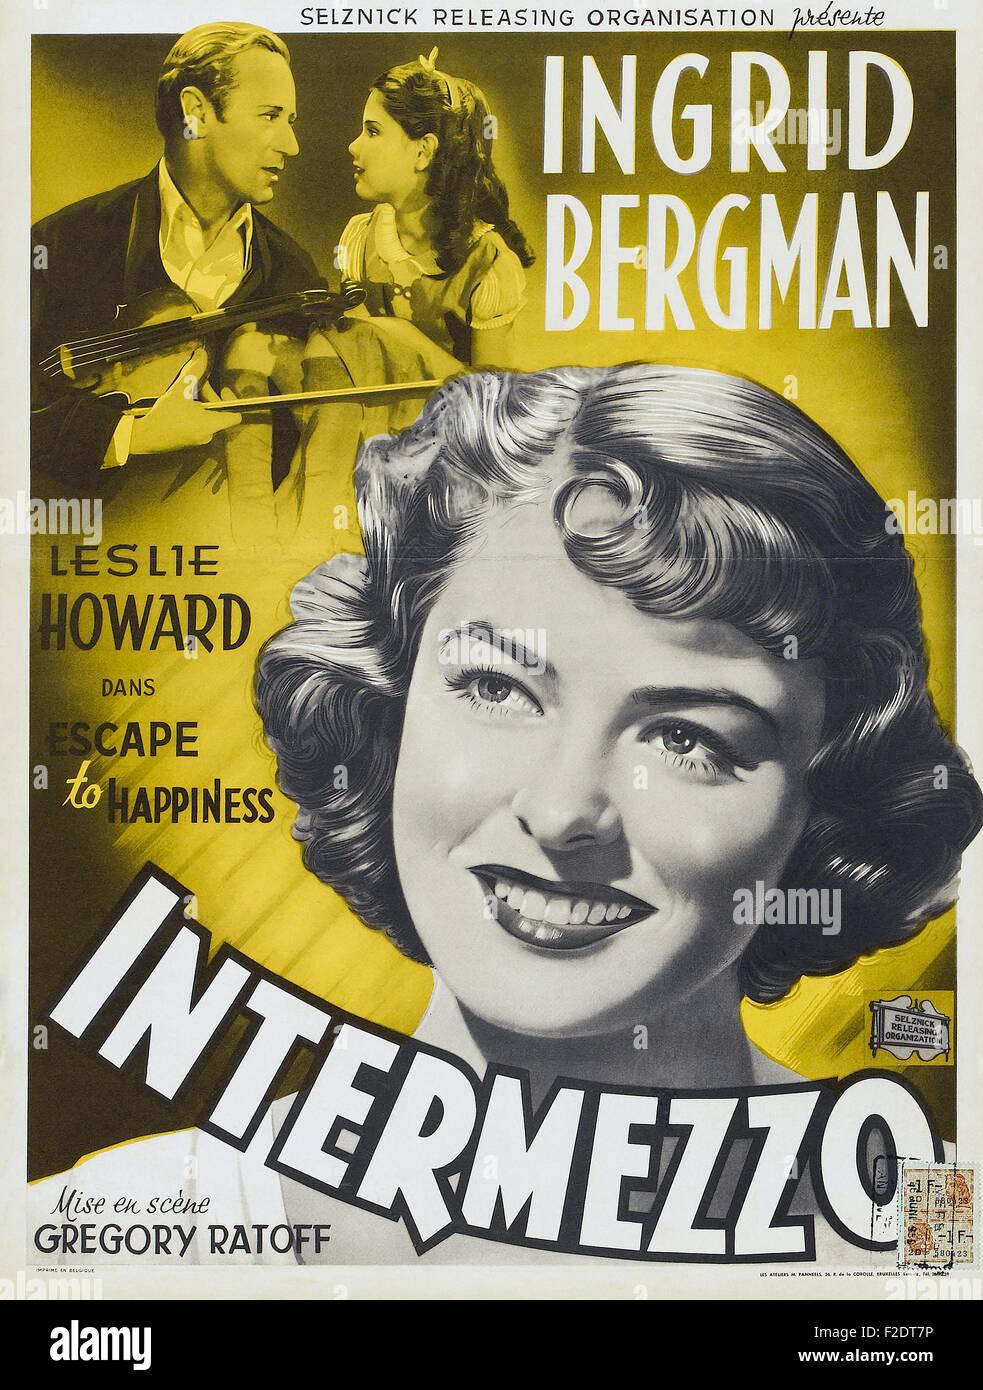 Intermezzo, A Love Story 03 - Movie Poster - Stock Image